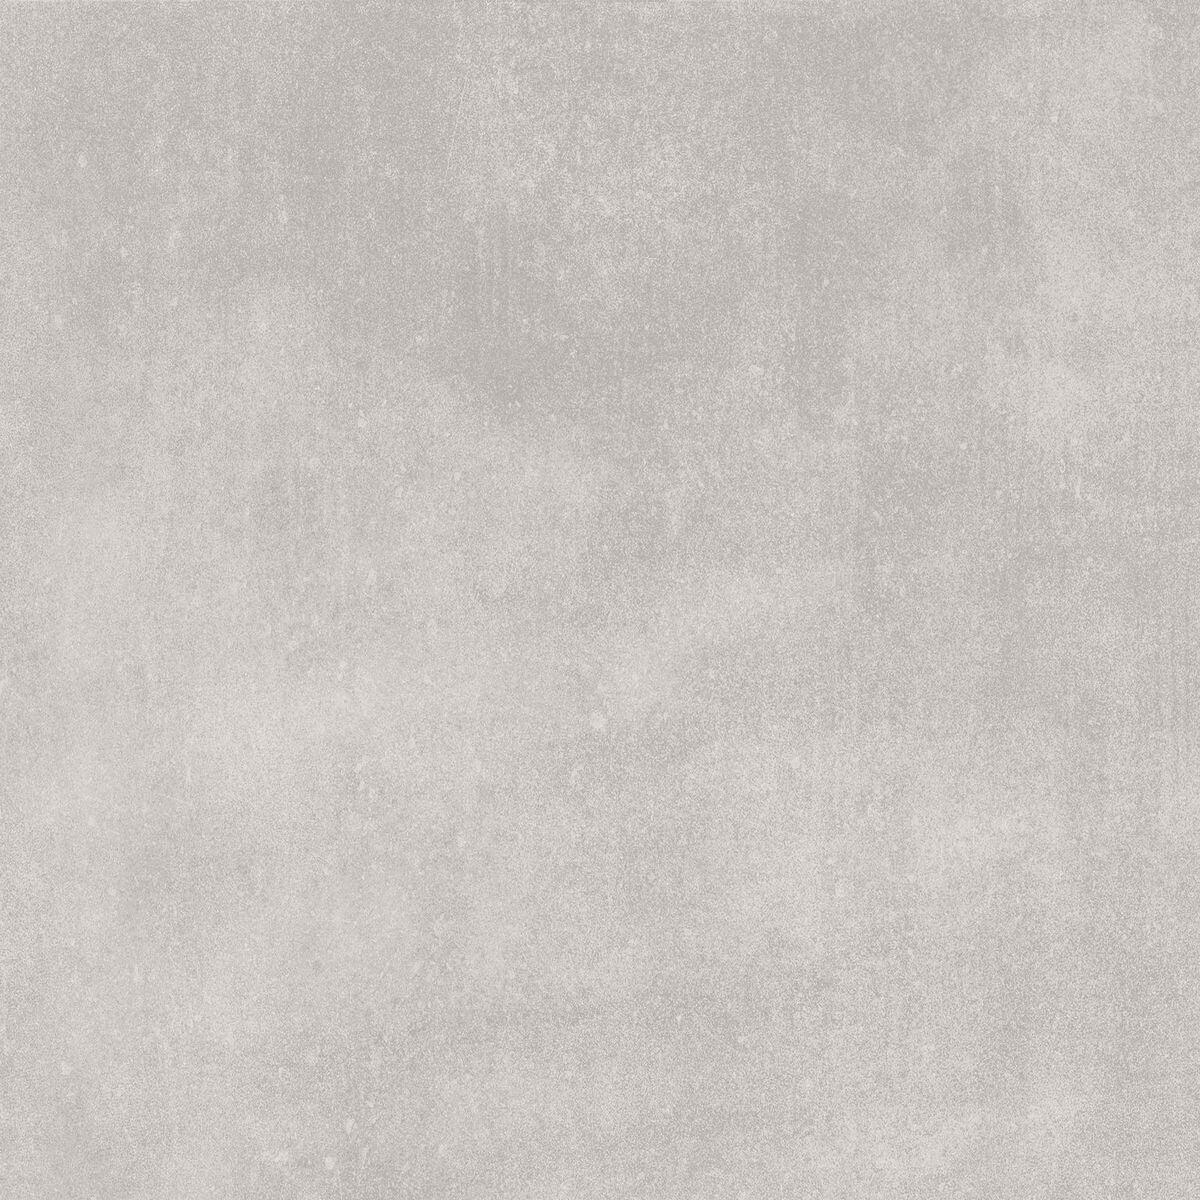 Ceramic Industries Soho Grey Eco SR 600x600mm_Stiles_Product_Image